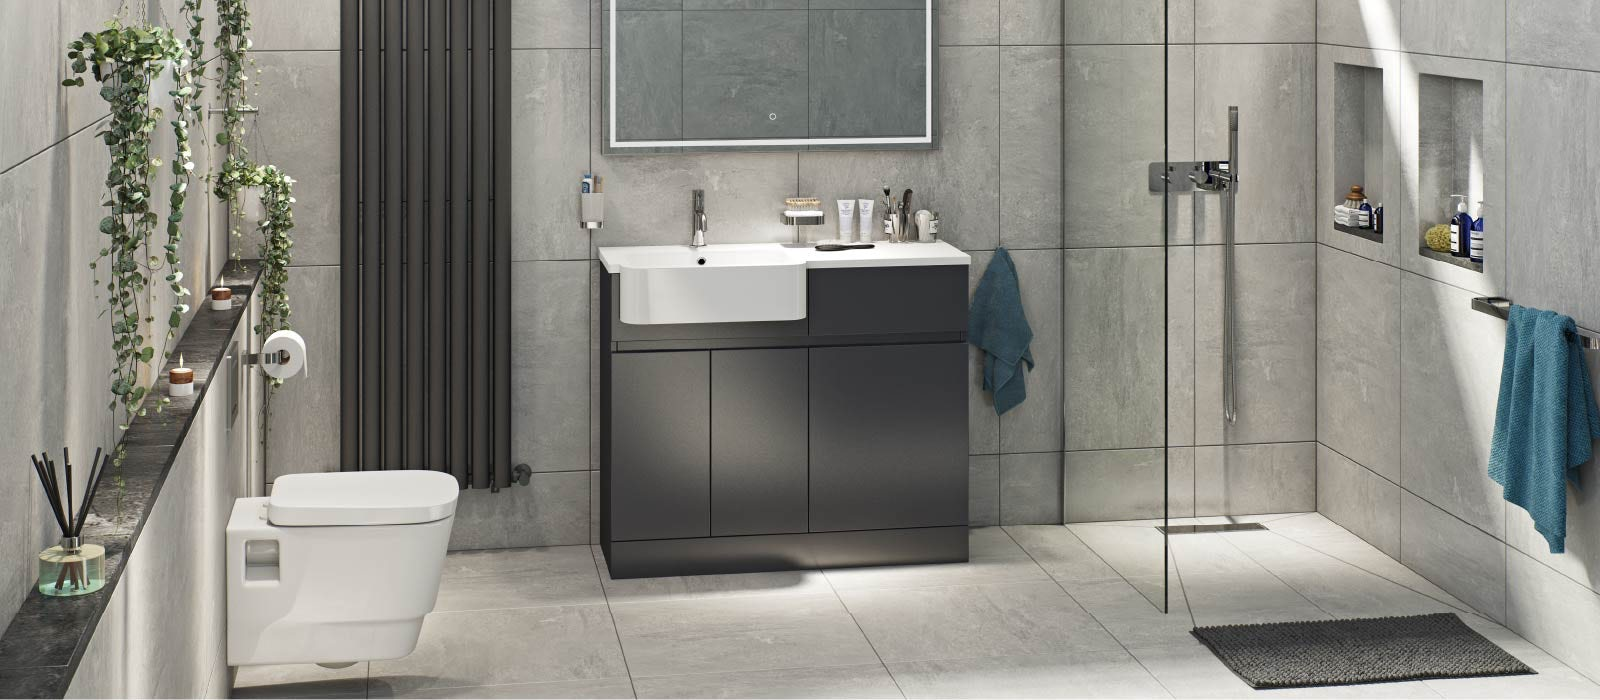 10 modern bathroom ideas for 2020 and beyond